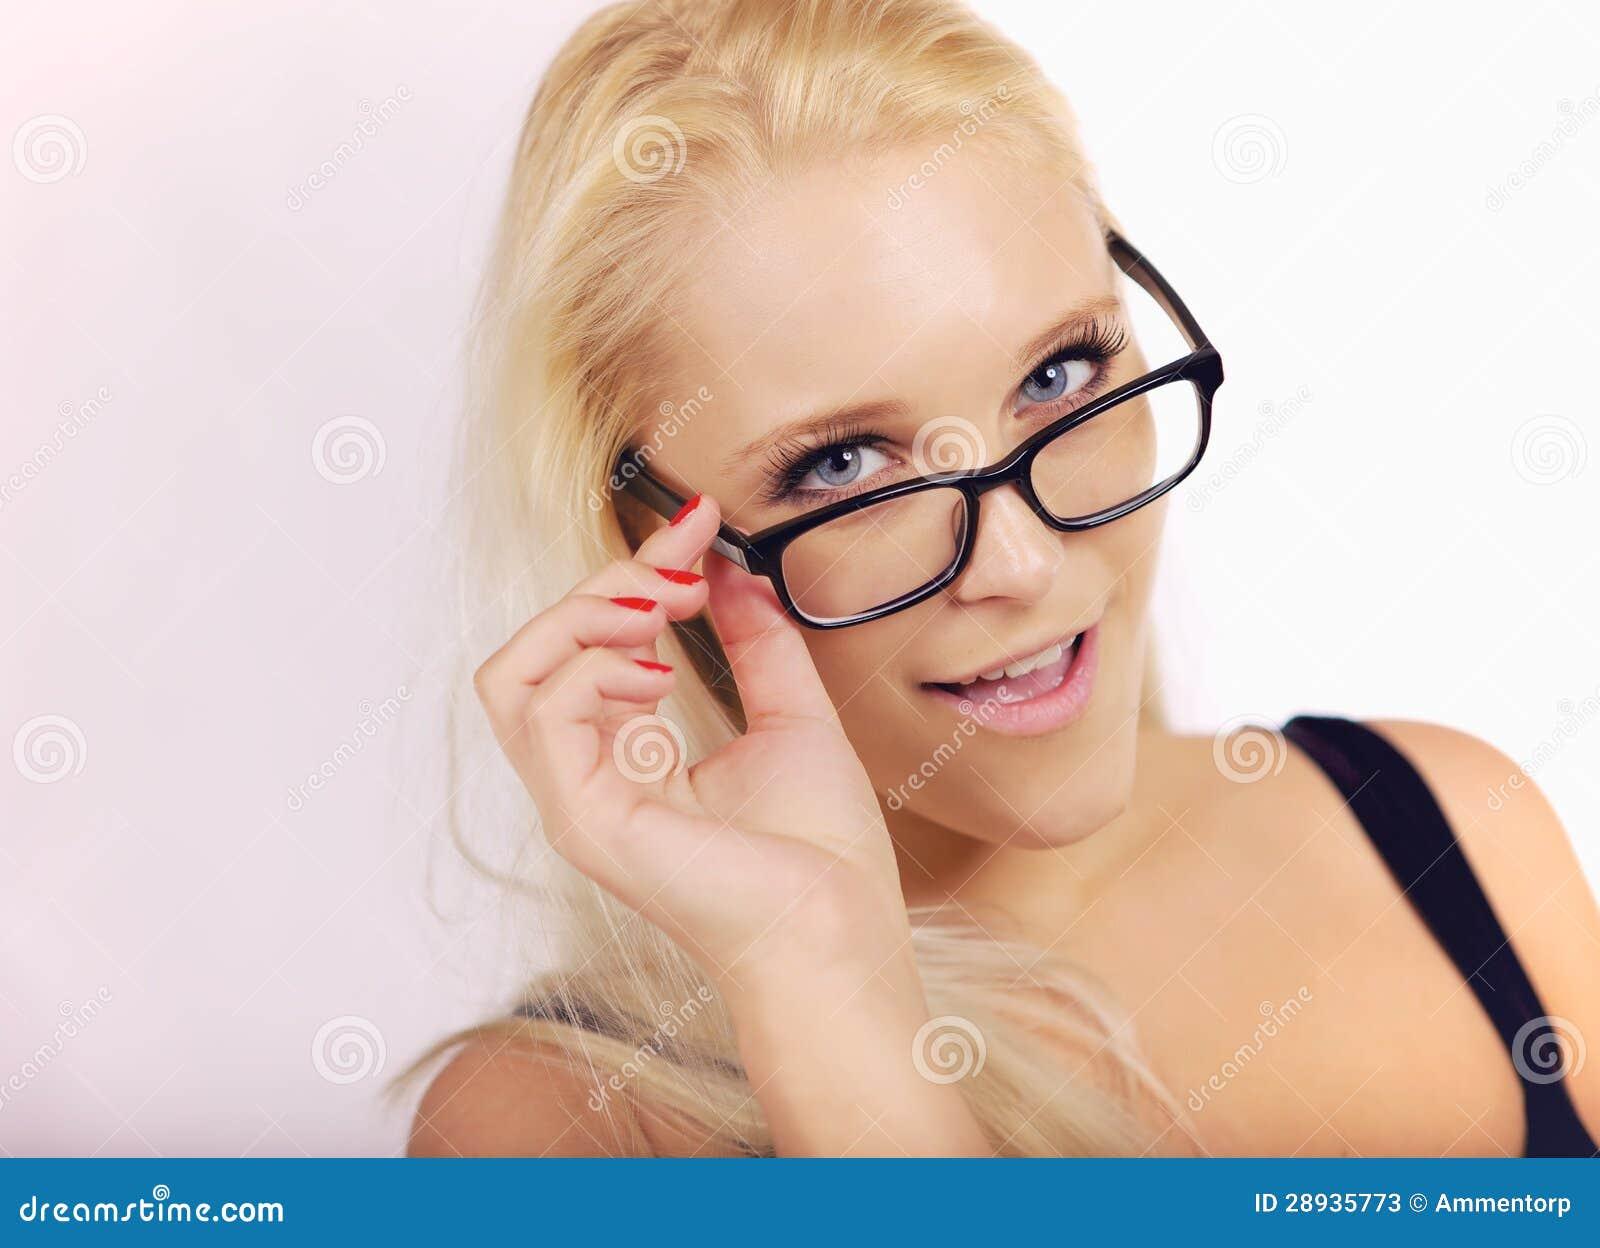 Pretty Girl Looking Very Smart in Her Eyewear